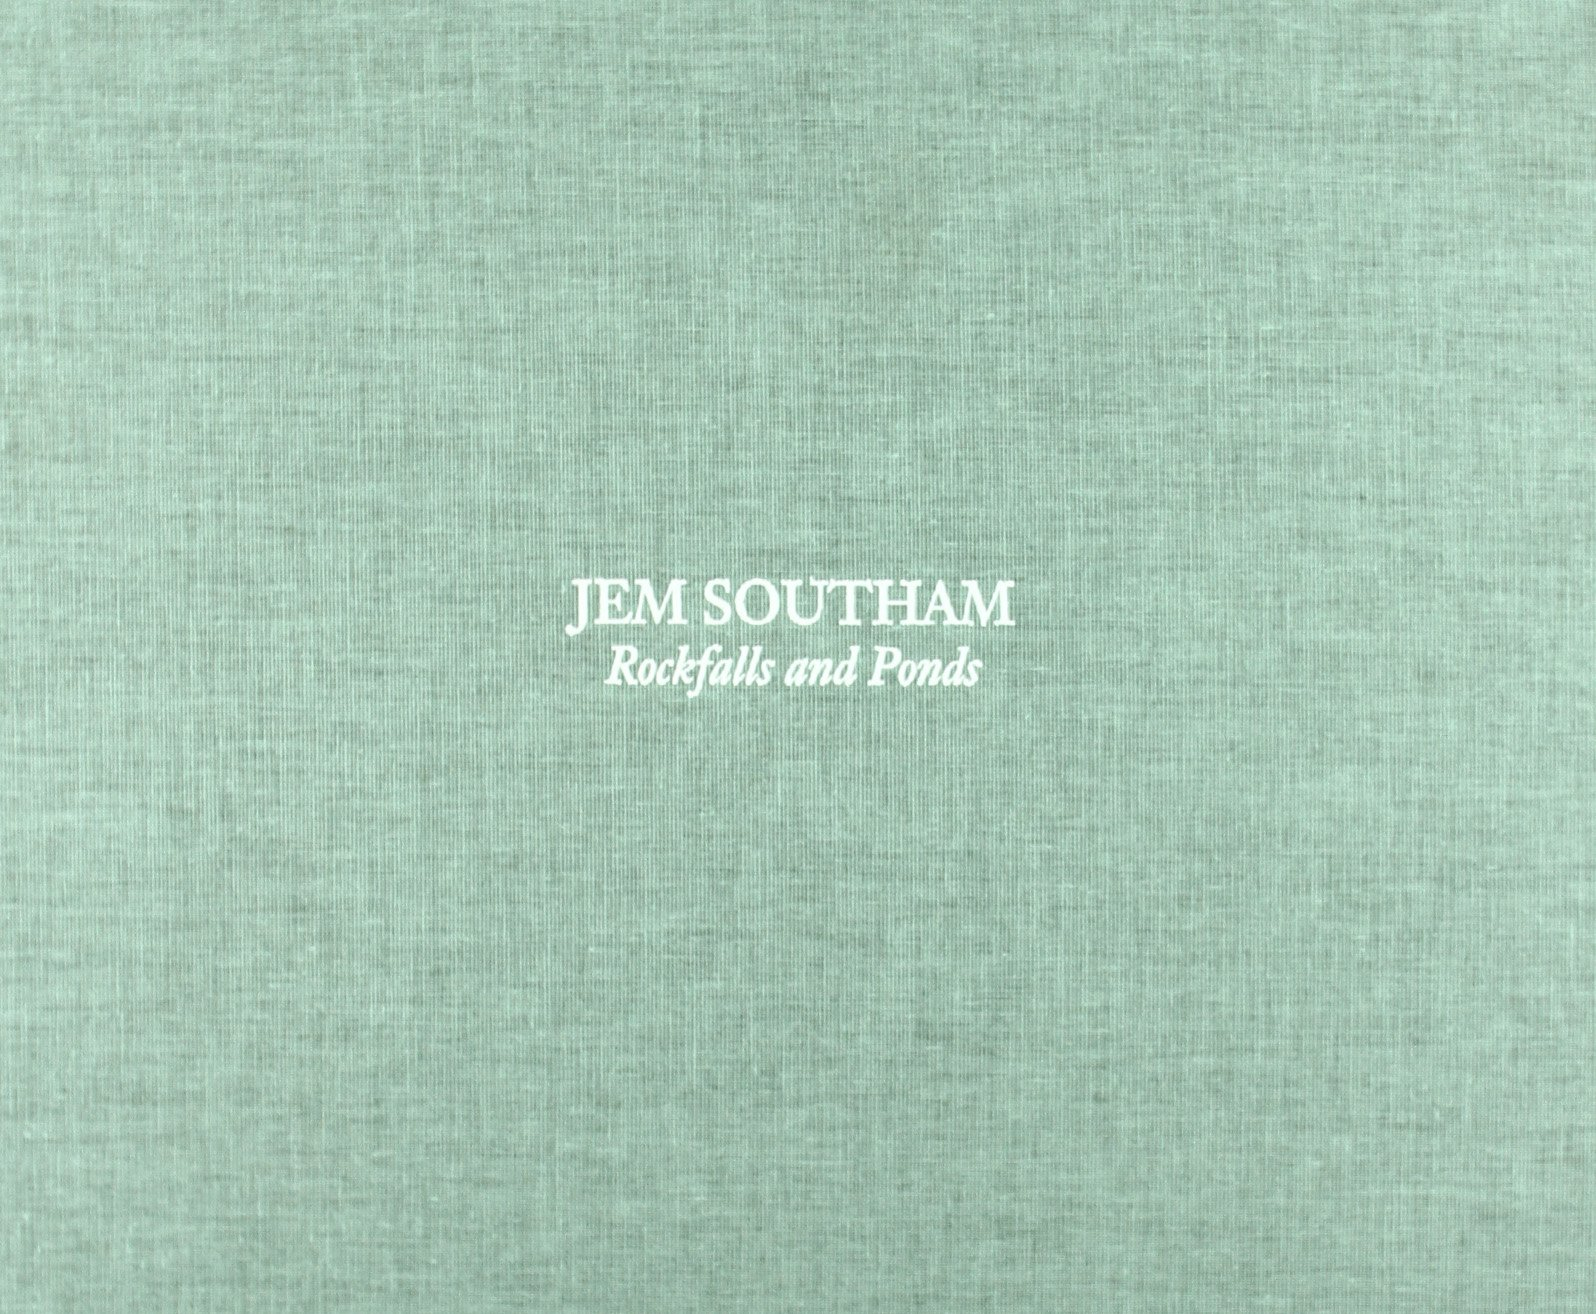 Jem Southam: Rockfalls and Ponds: Amazon.es: SOUTHAM, JEM ...